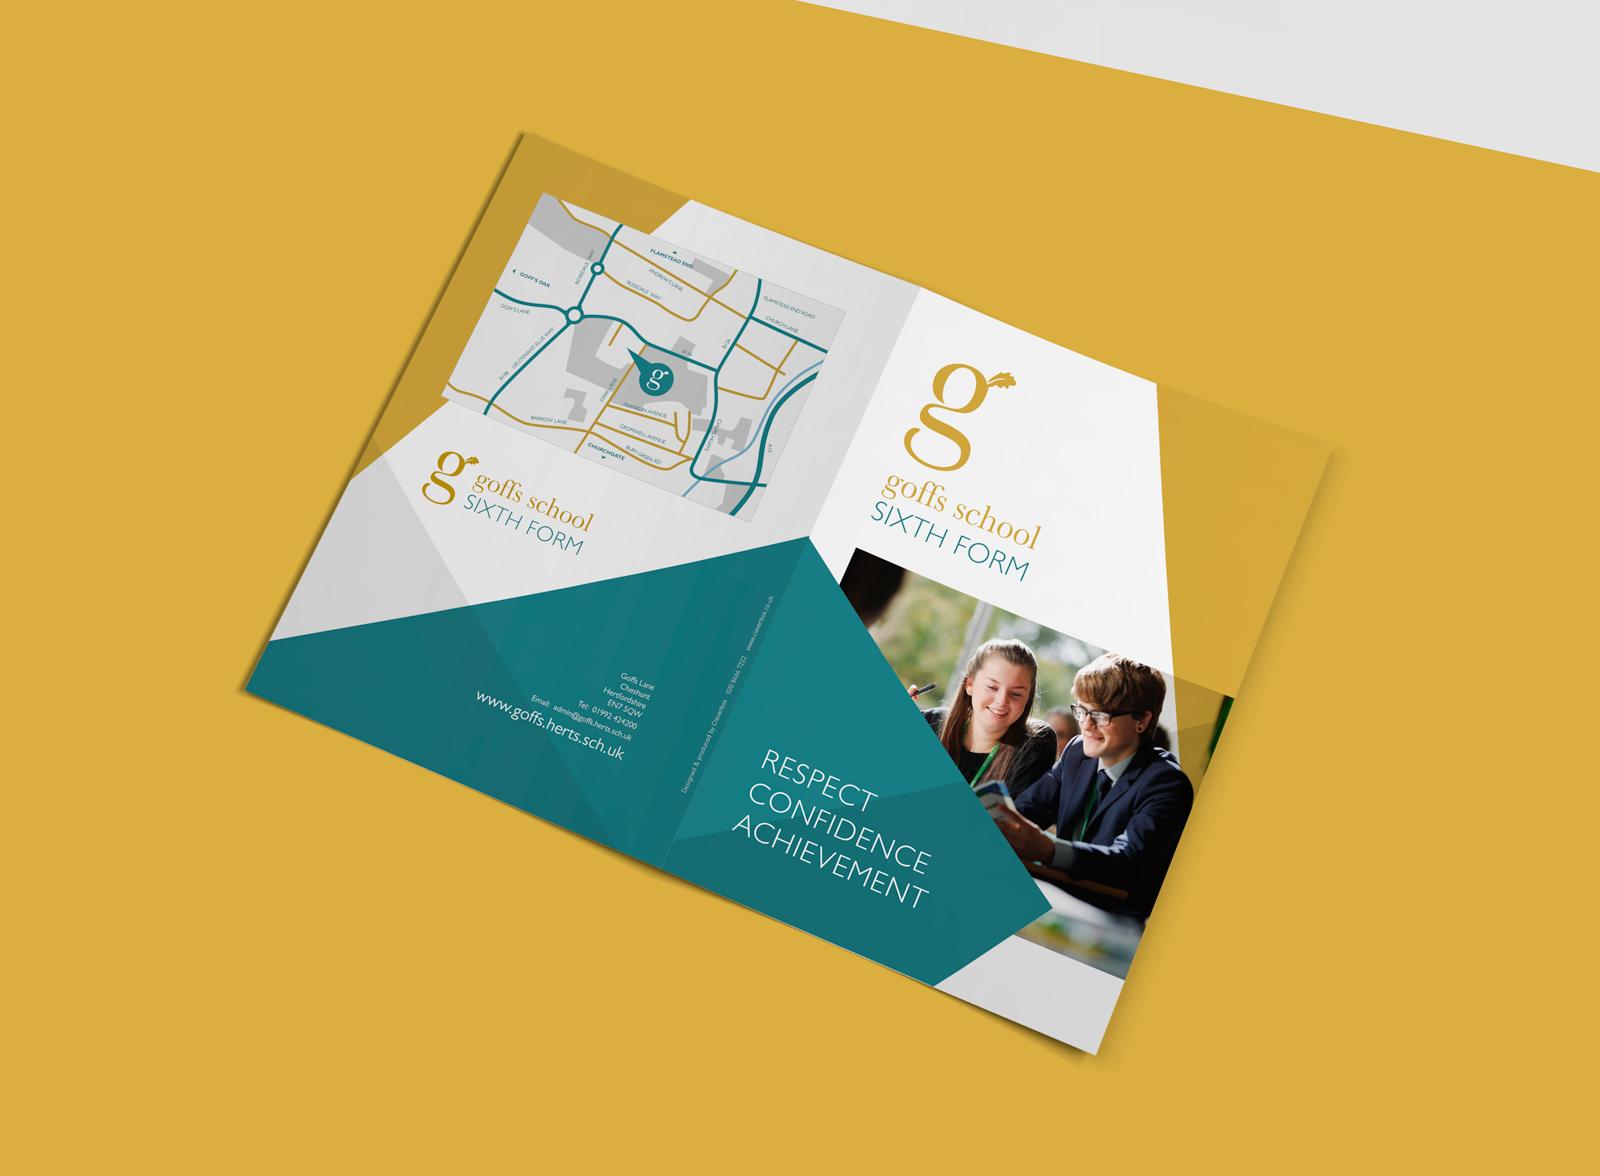 Goffs School Sixth Form Prospectus design